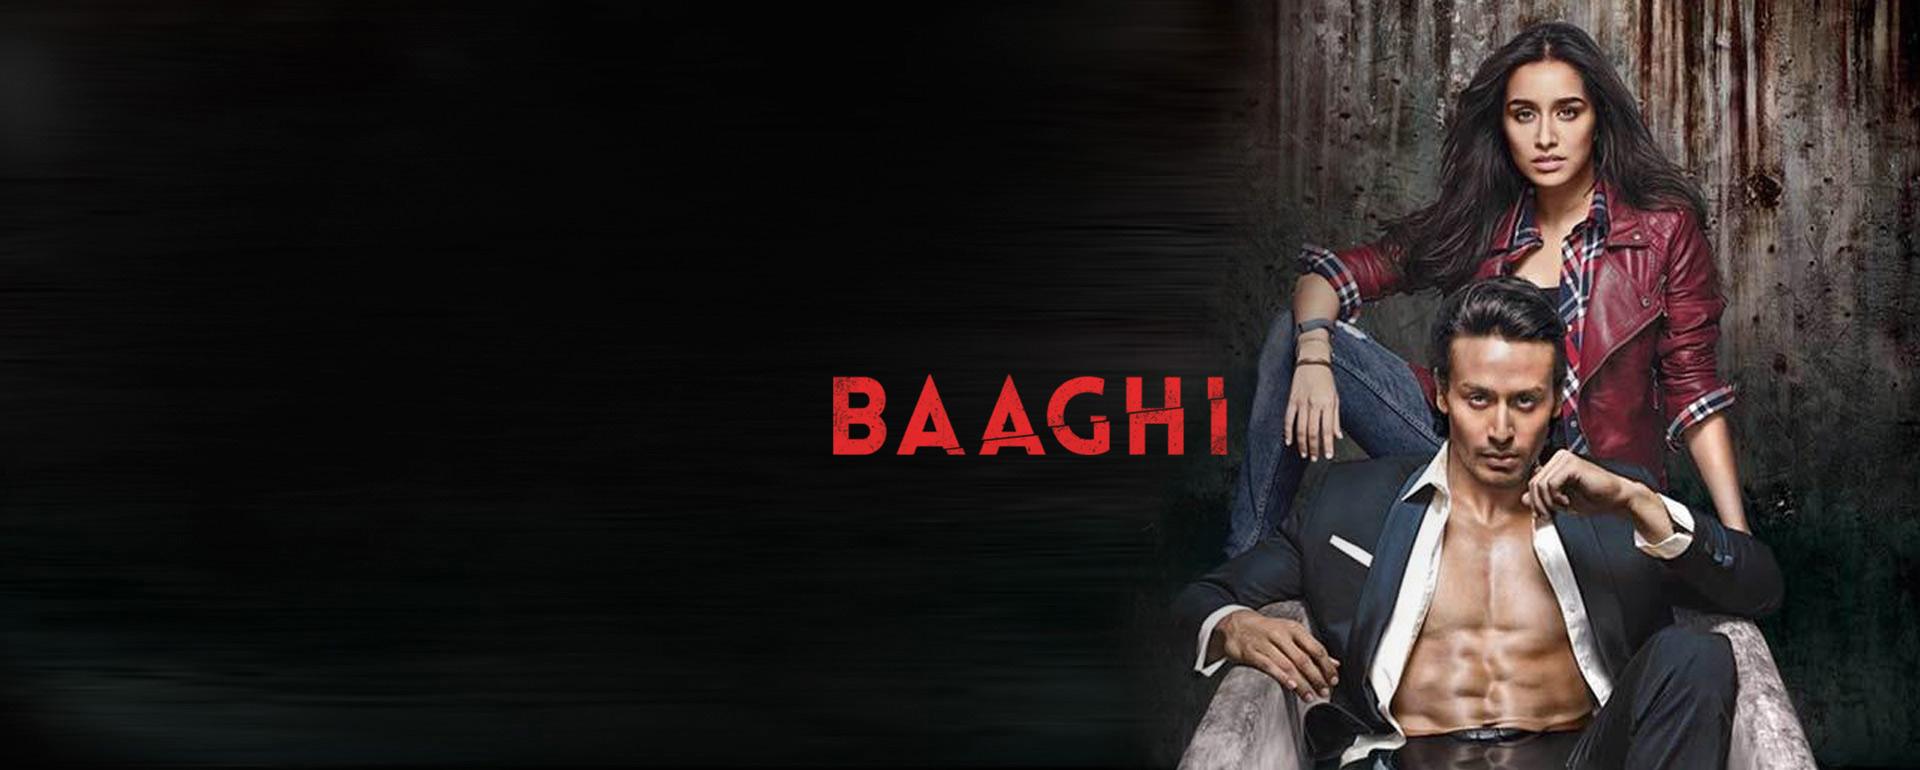 BAAGHI - REBELS IN LOVE